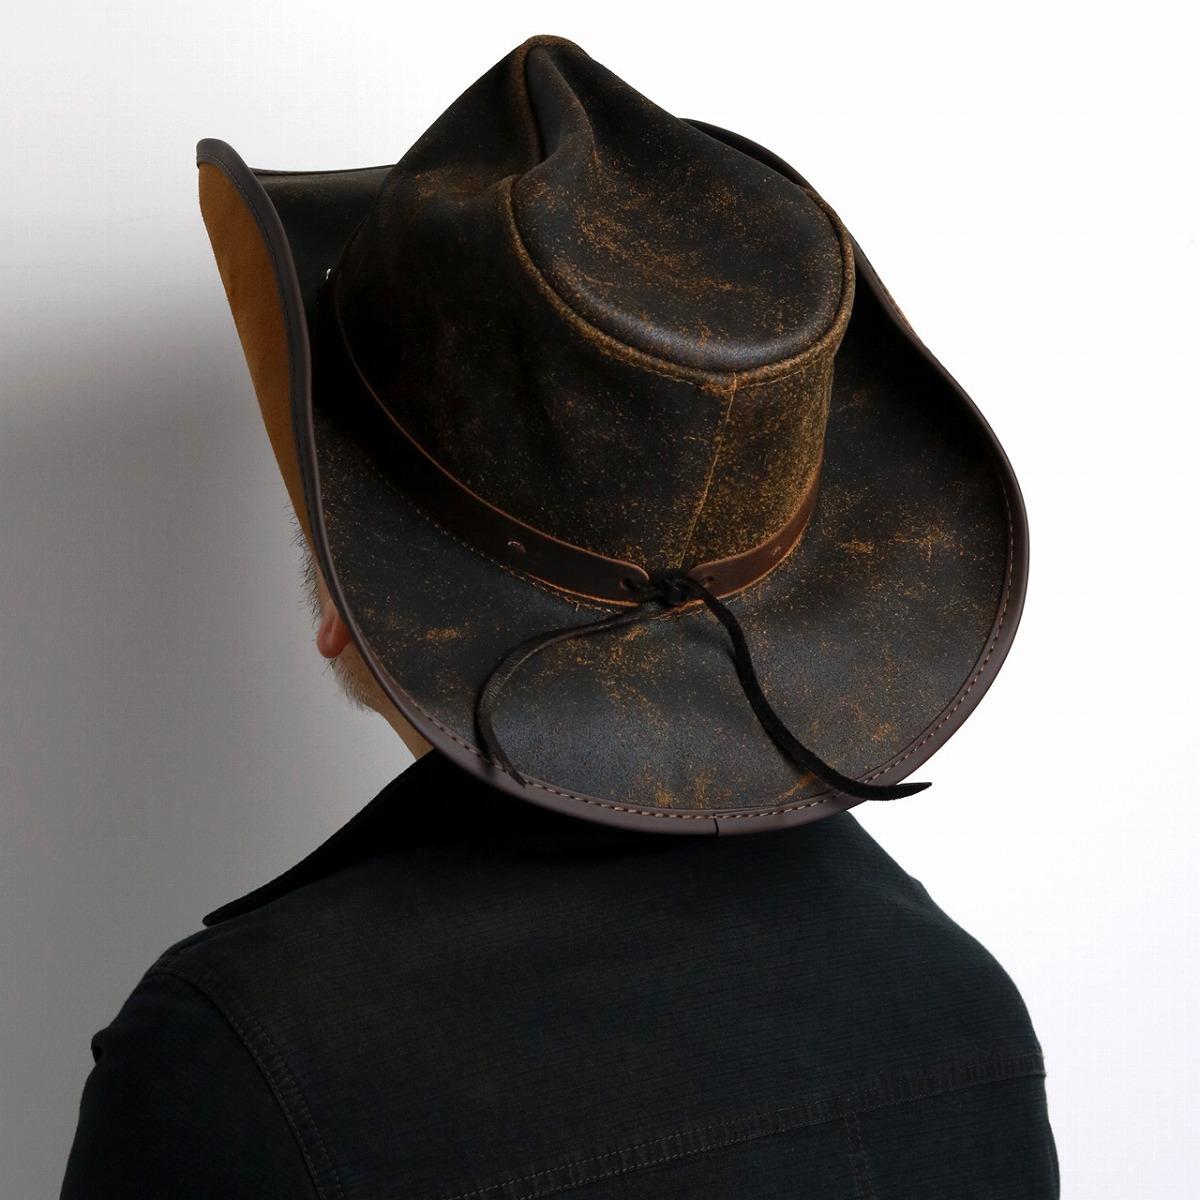 232e594eacd The lady s gentleman hat dark brown walnut  cowboy hat  man hat present  Christmas gift that Western film California western hat genuine leather is  light in ...